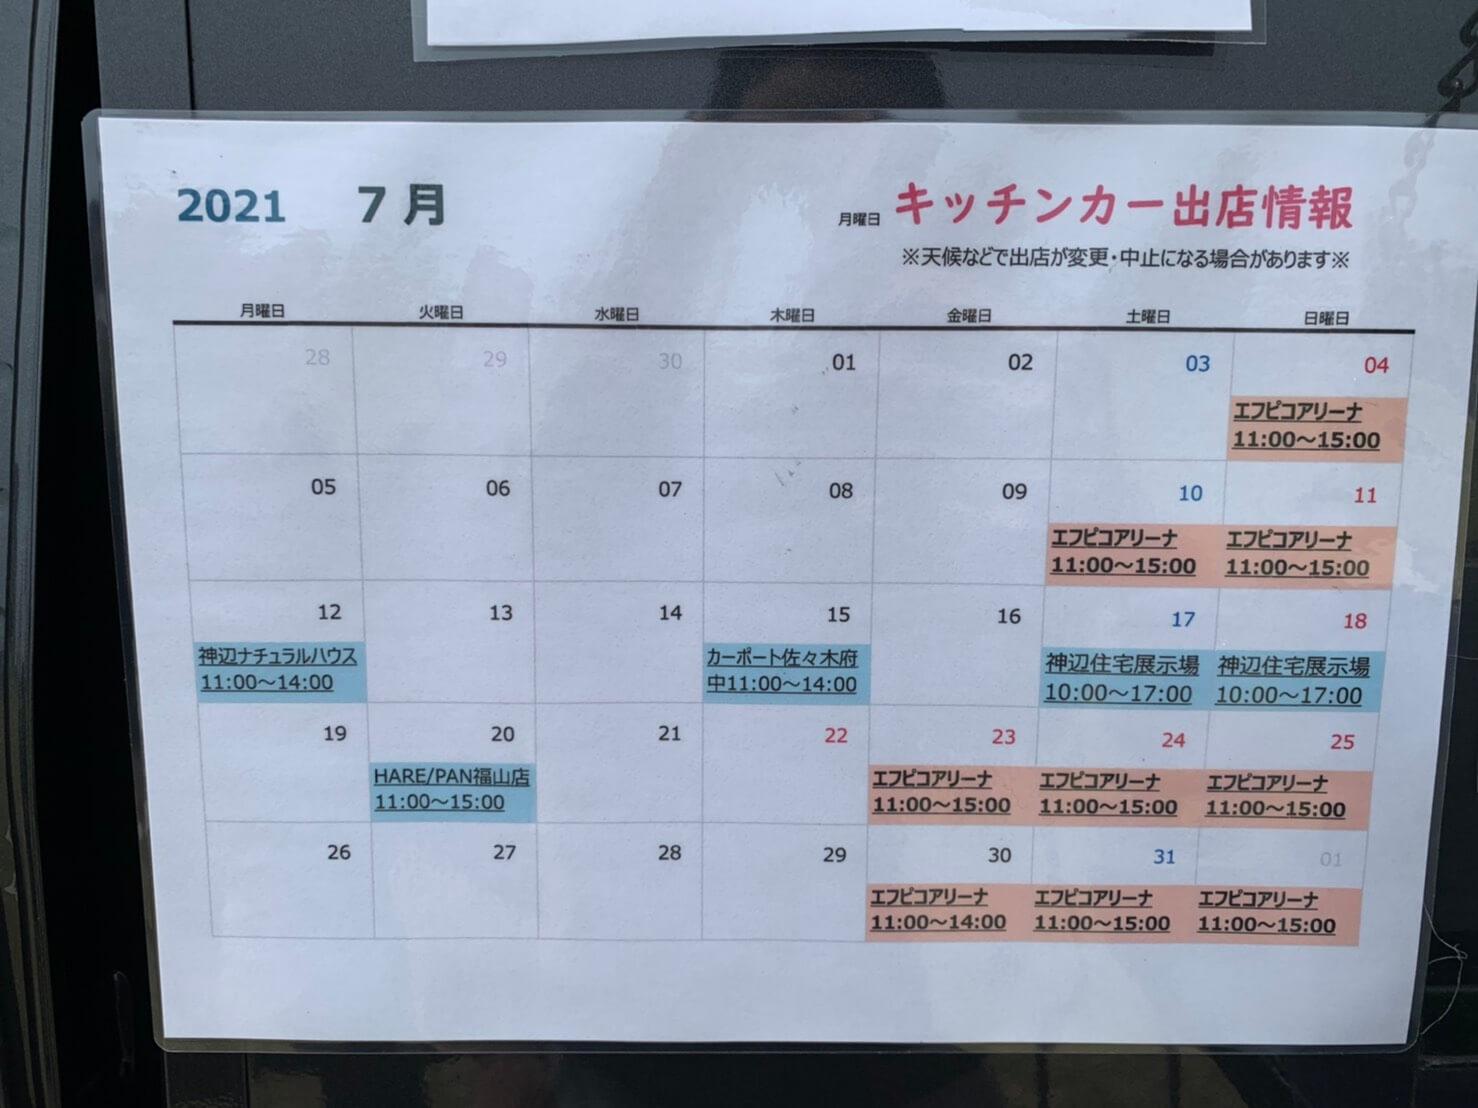 tsujino7月のスケジュール